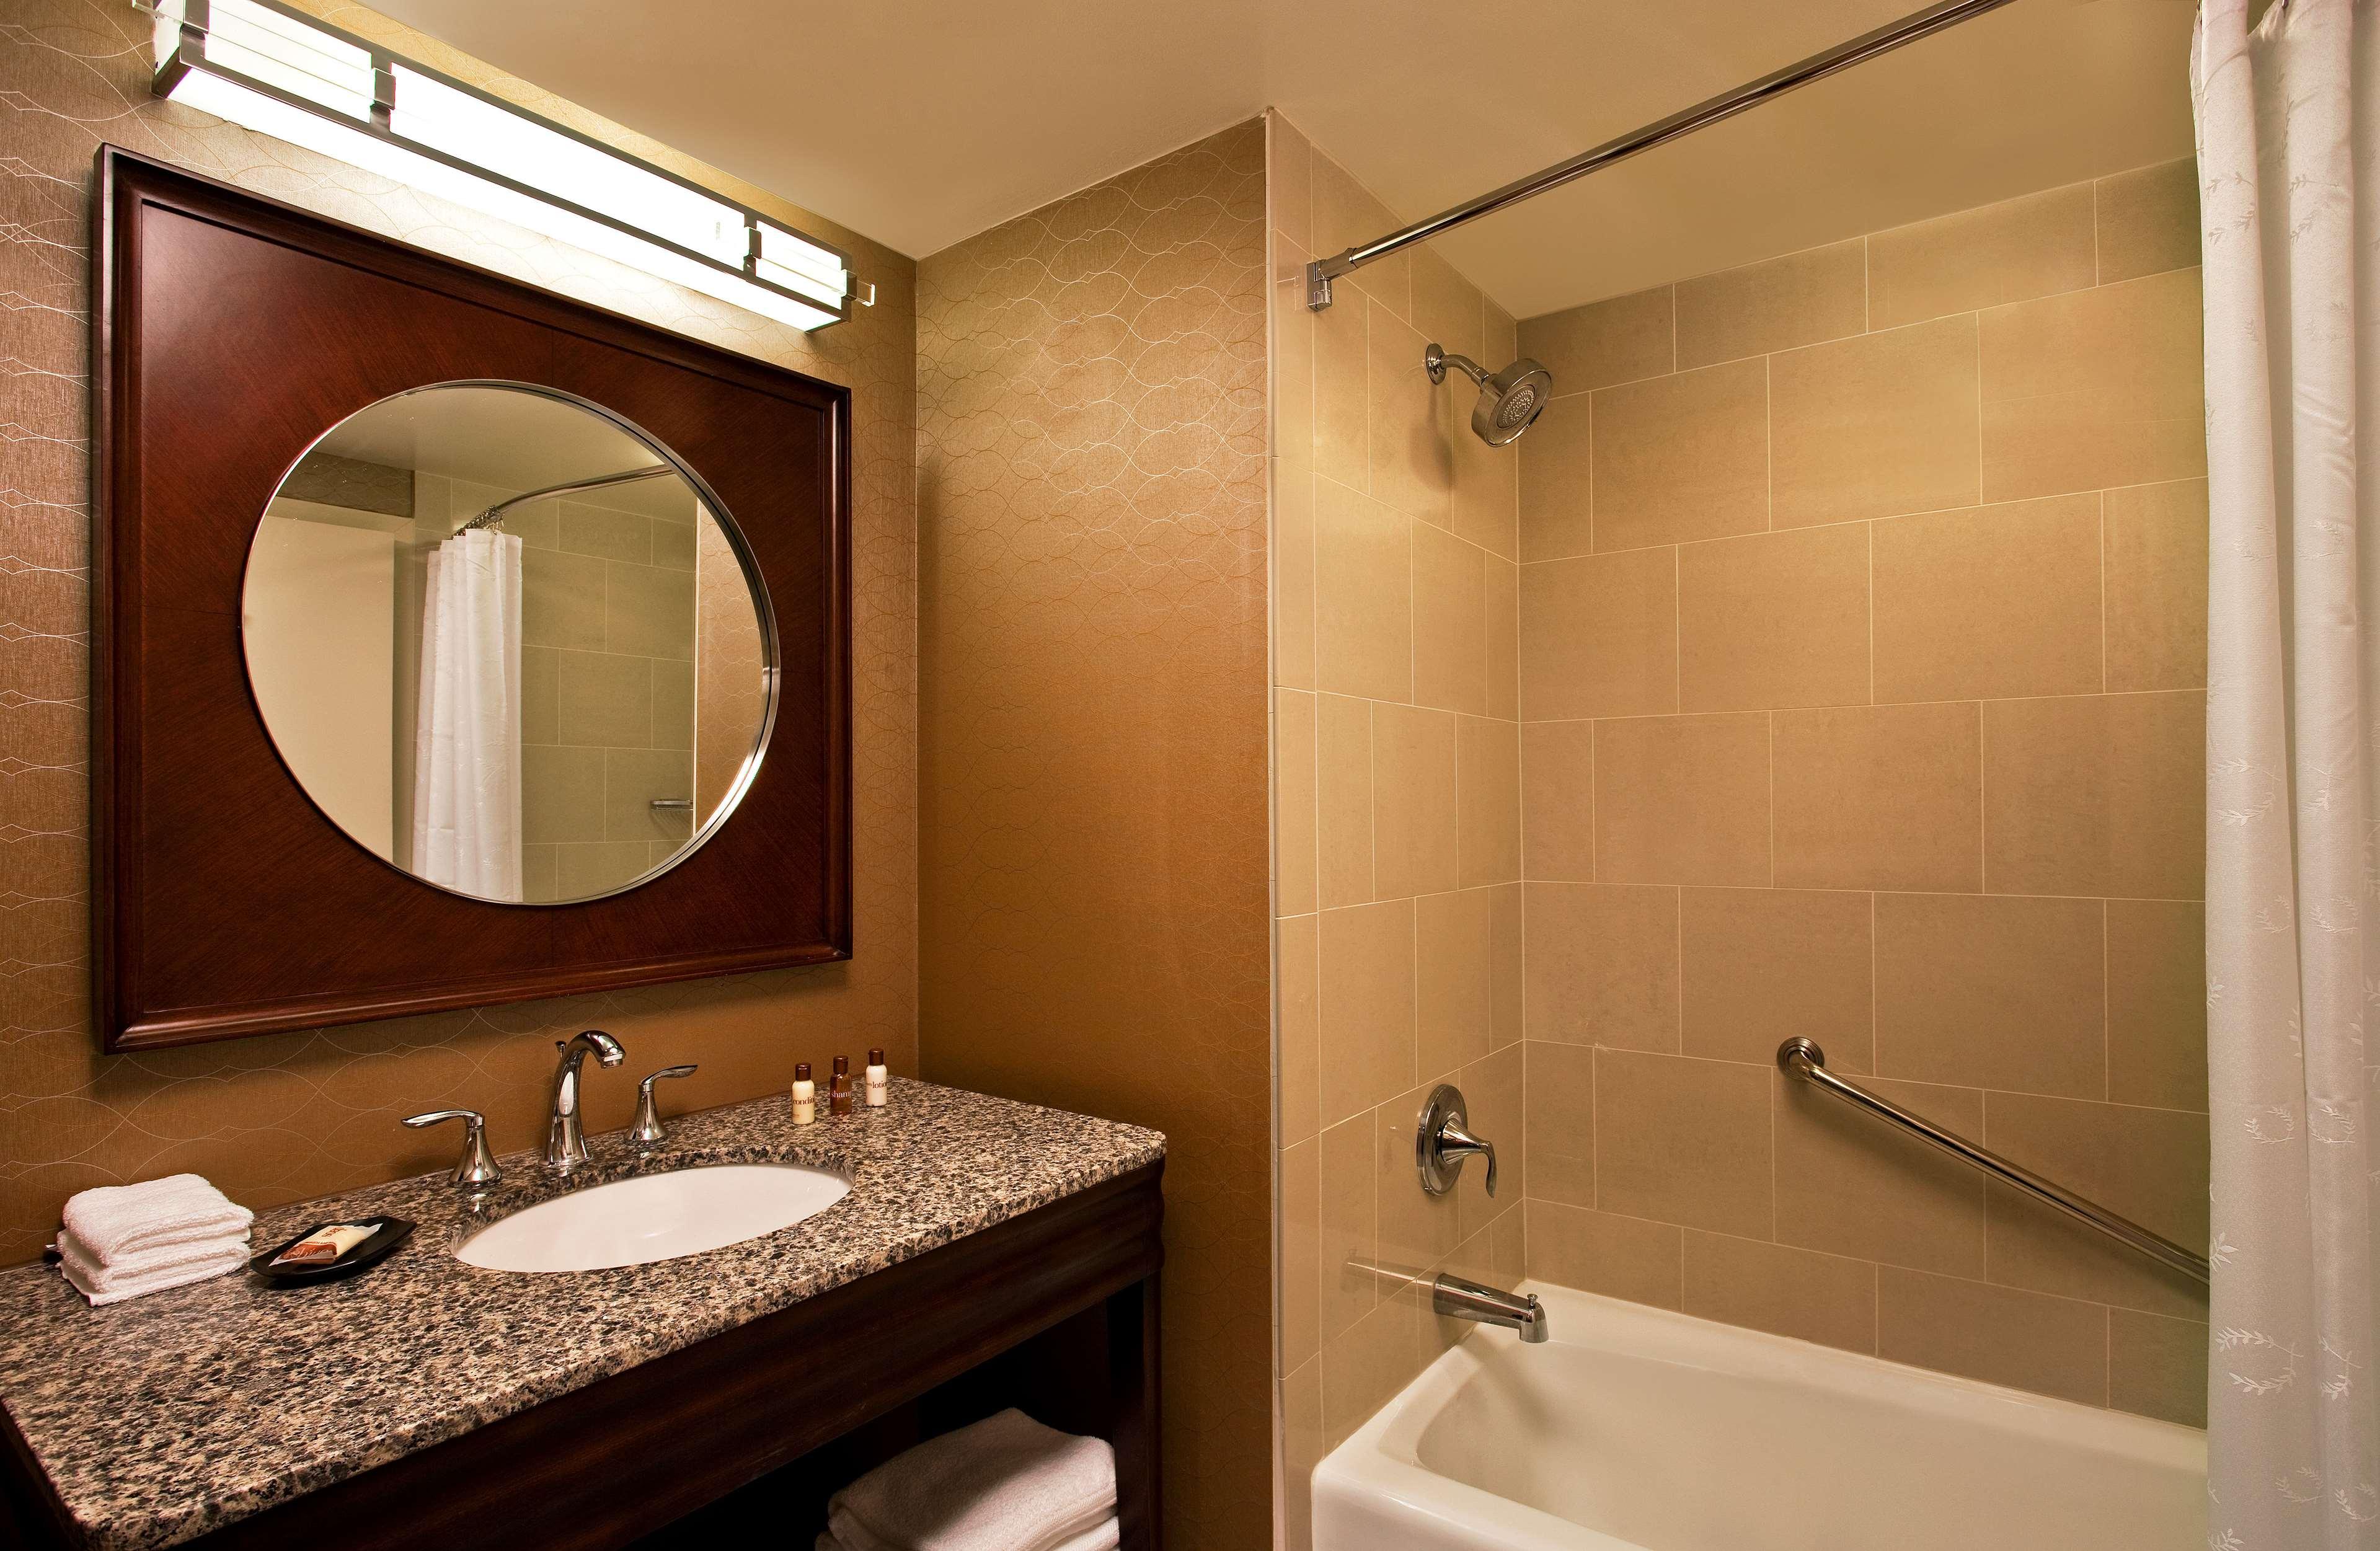 Sheraton Tampa Brandon Hotel image 6